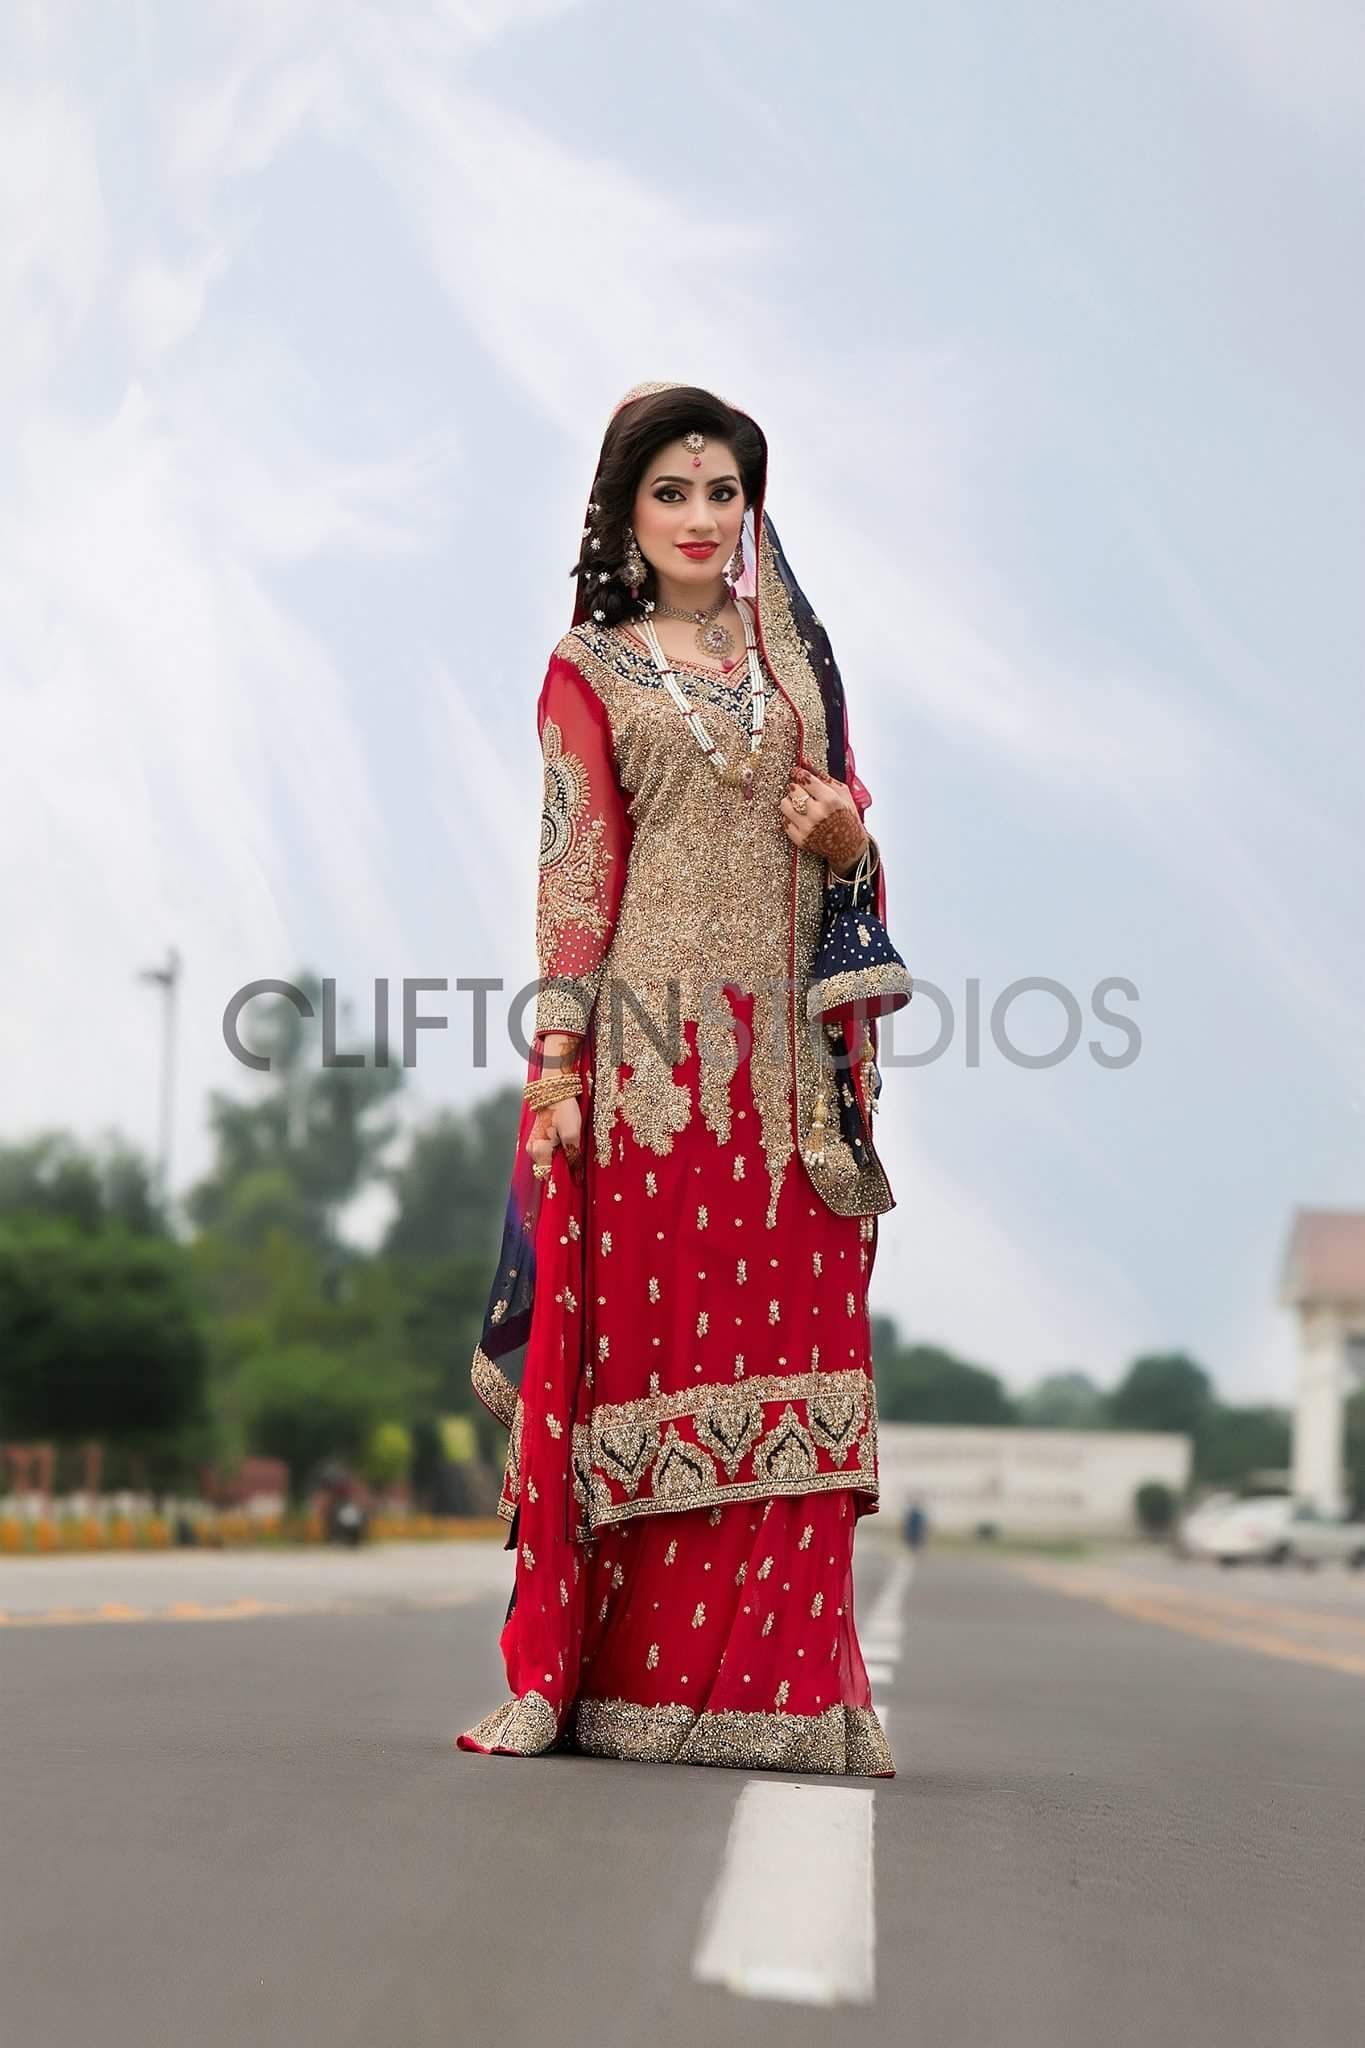 Clifton studio photography Bridal wear